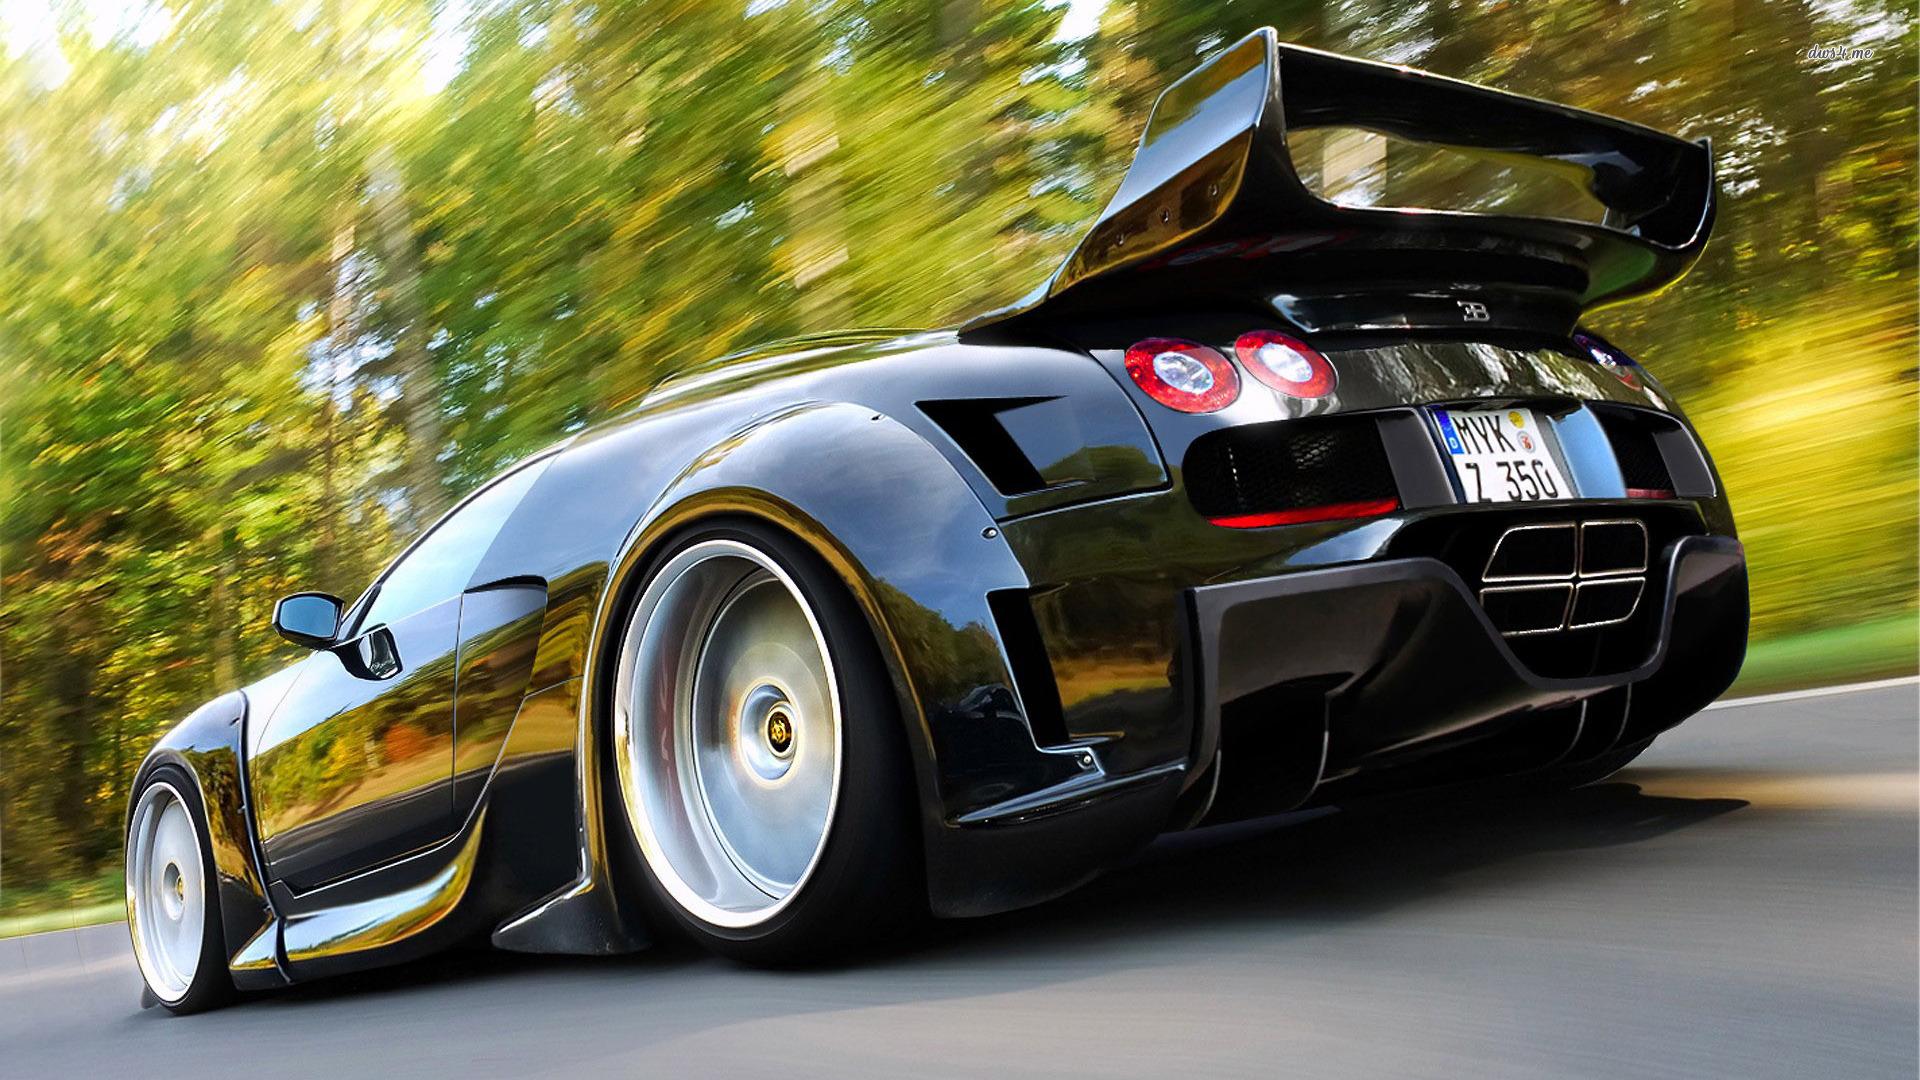 Download Bugatti Veyron Car Wallpapers 50 Cool Bugatti Wallpapers Backgrounds For Free Download